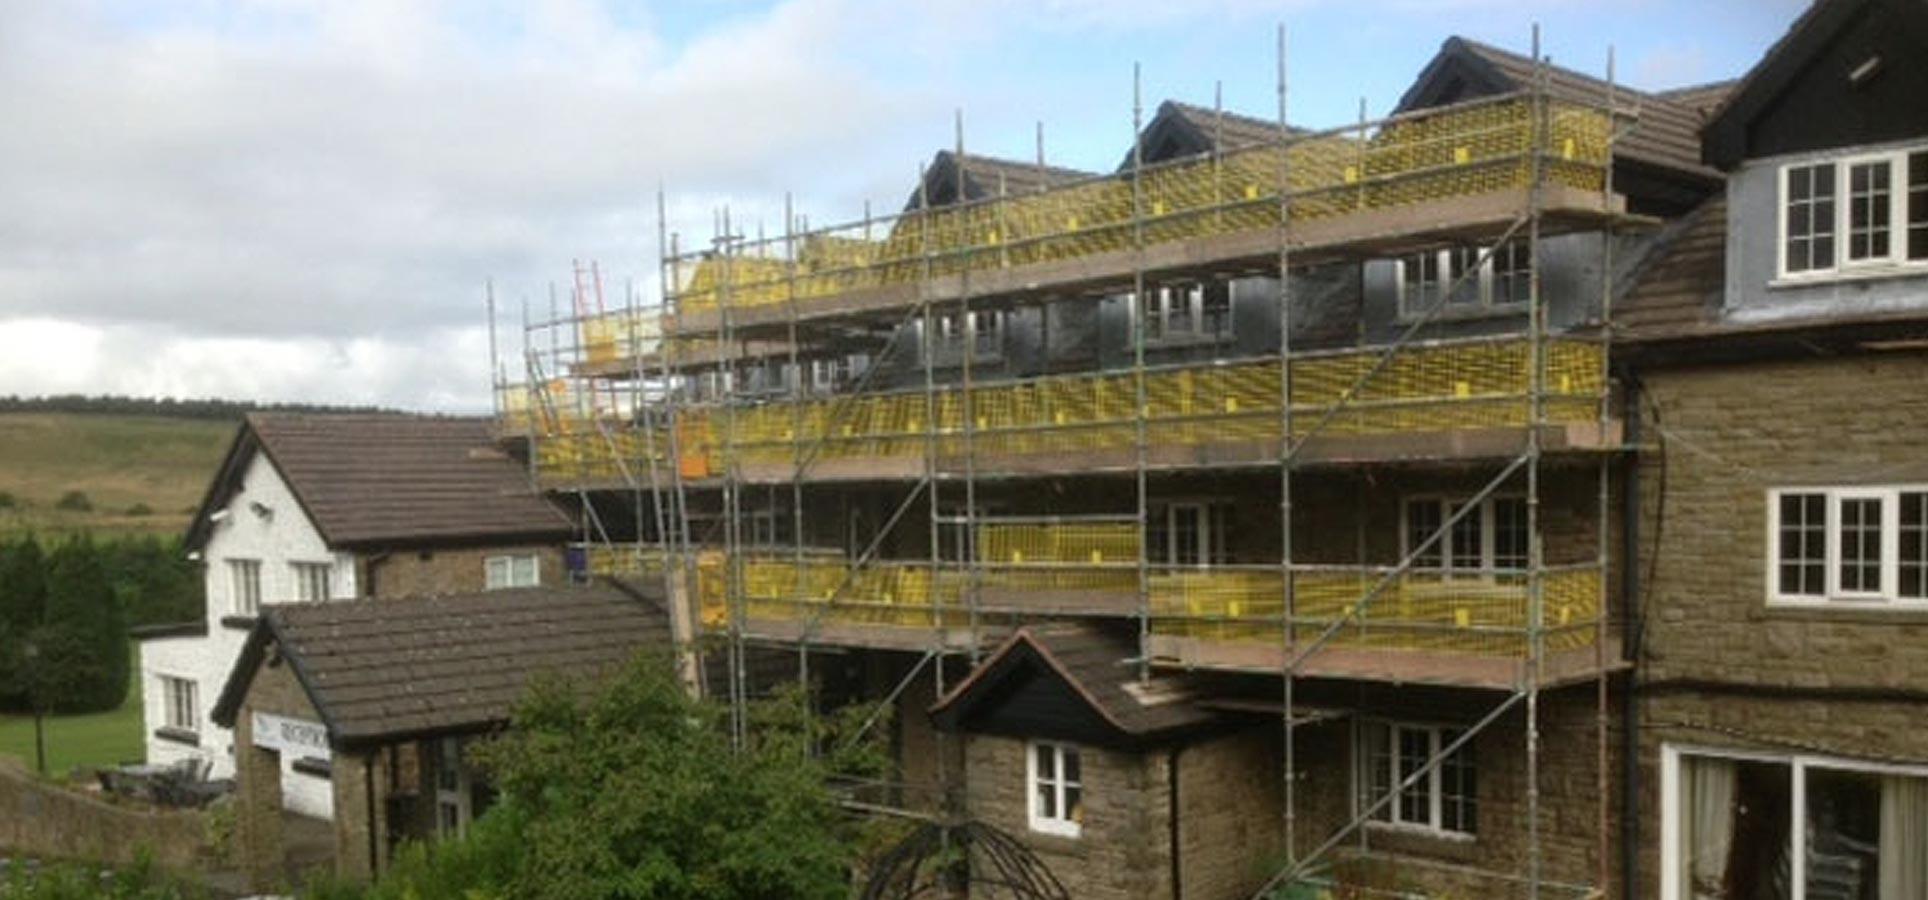 Moorside, Jessops Construction Ltd